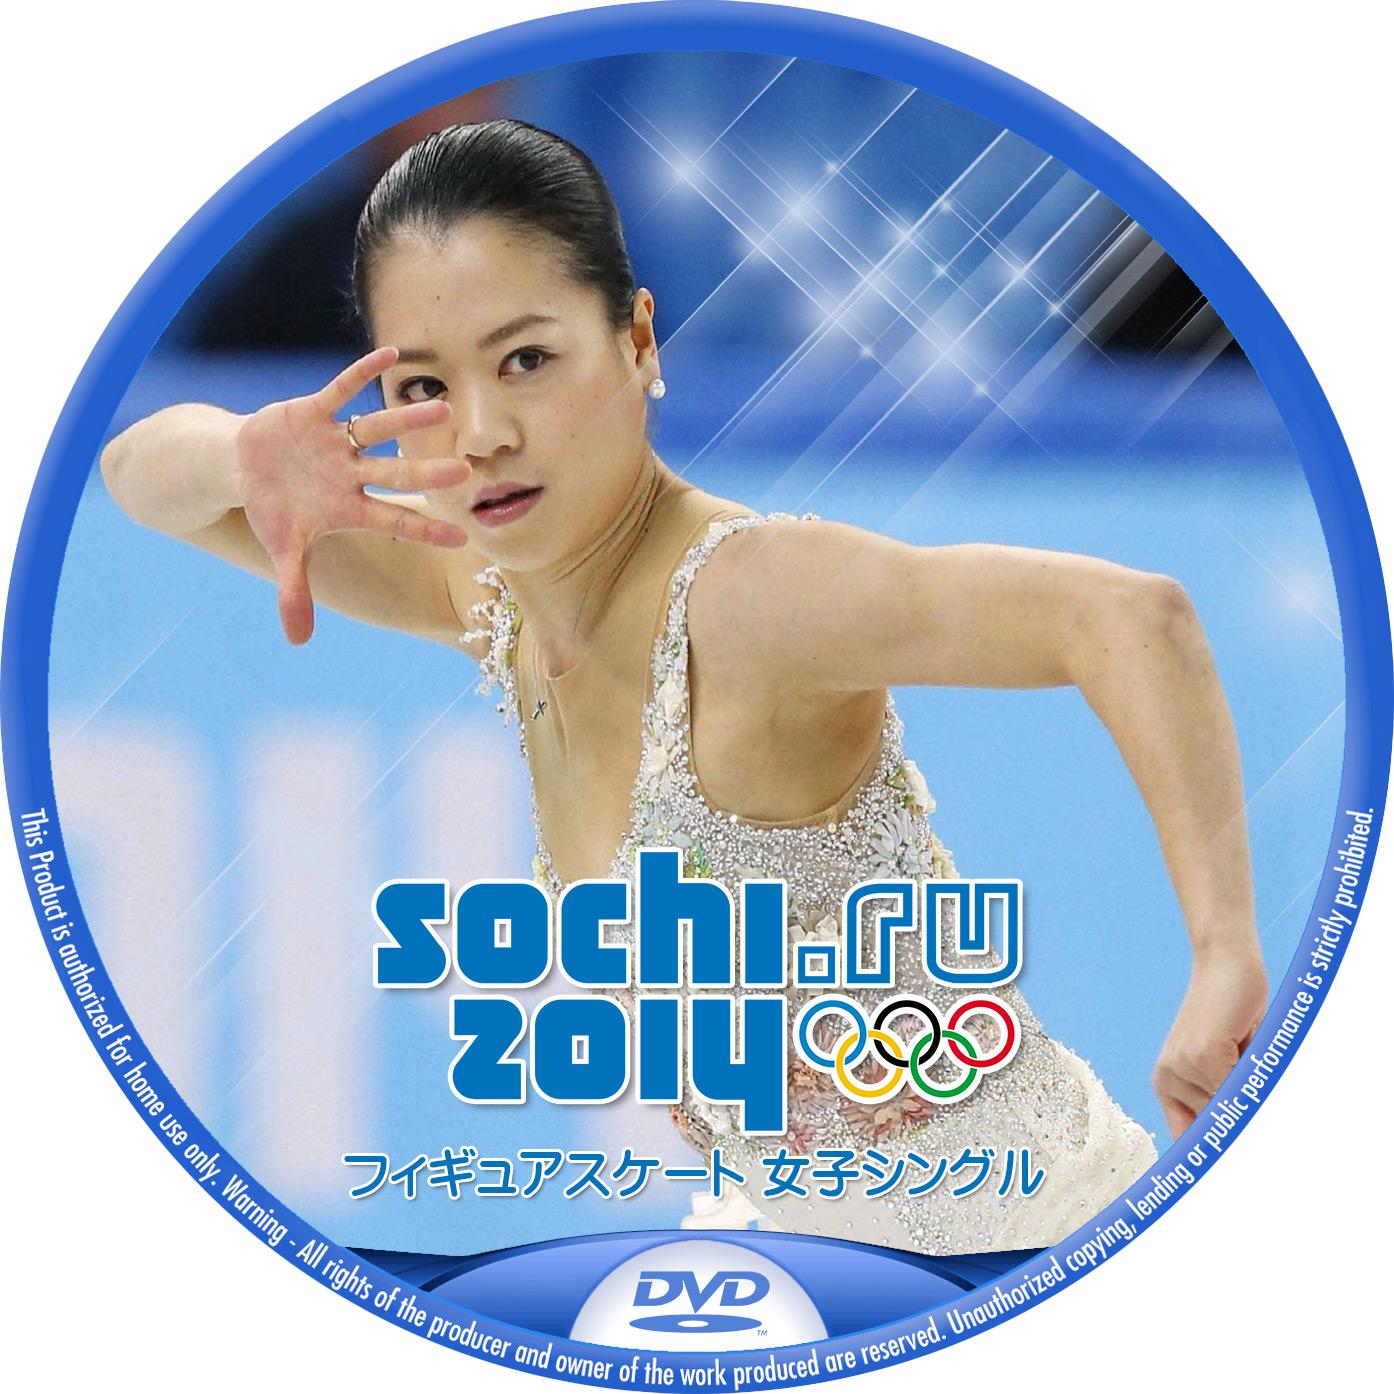 Sochi_Figure_Woens-DVD4